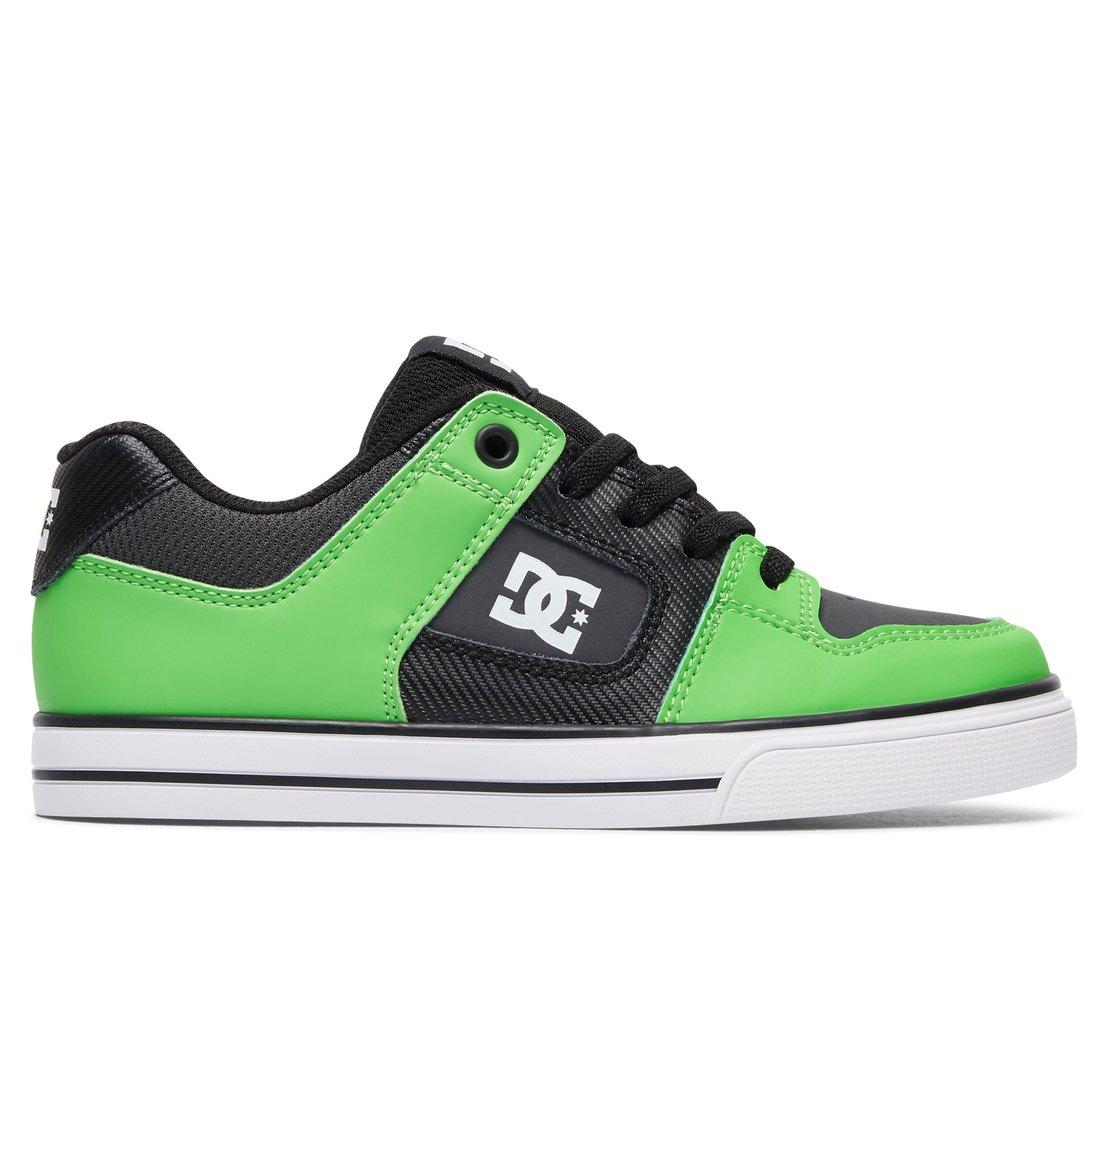 kid 39 s pure elastic se shoes adbs300273 dc shoes. Black Bedroom Furniture Sets. Home Design Ideas